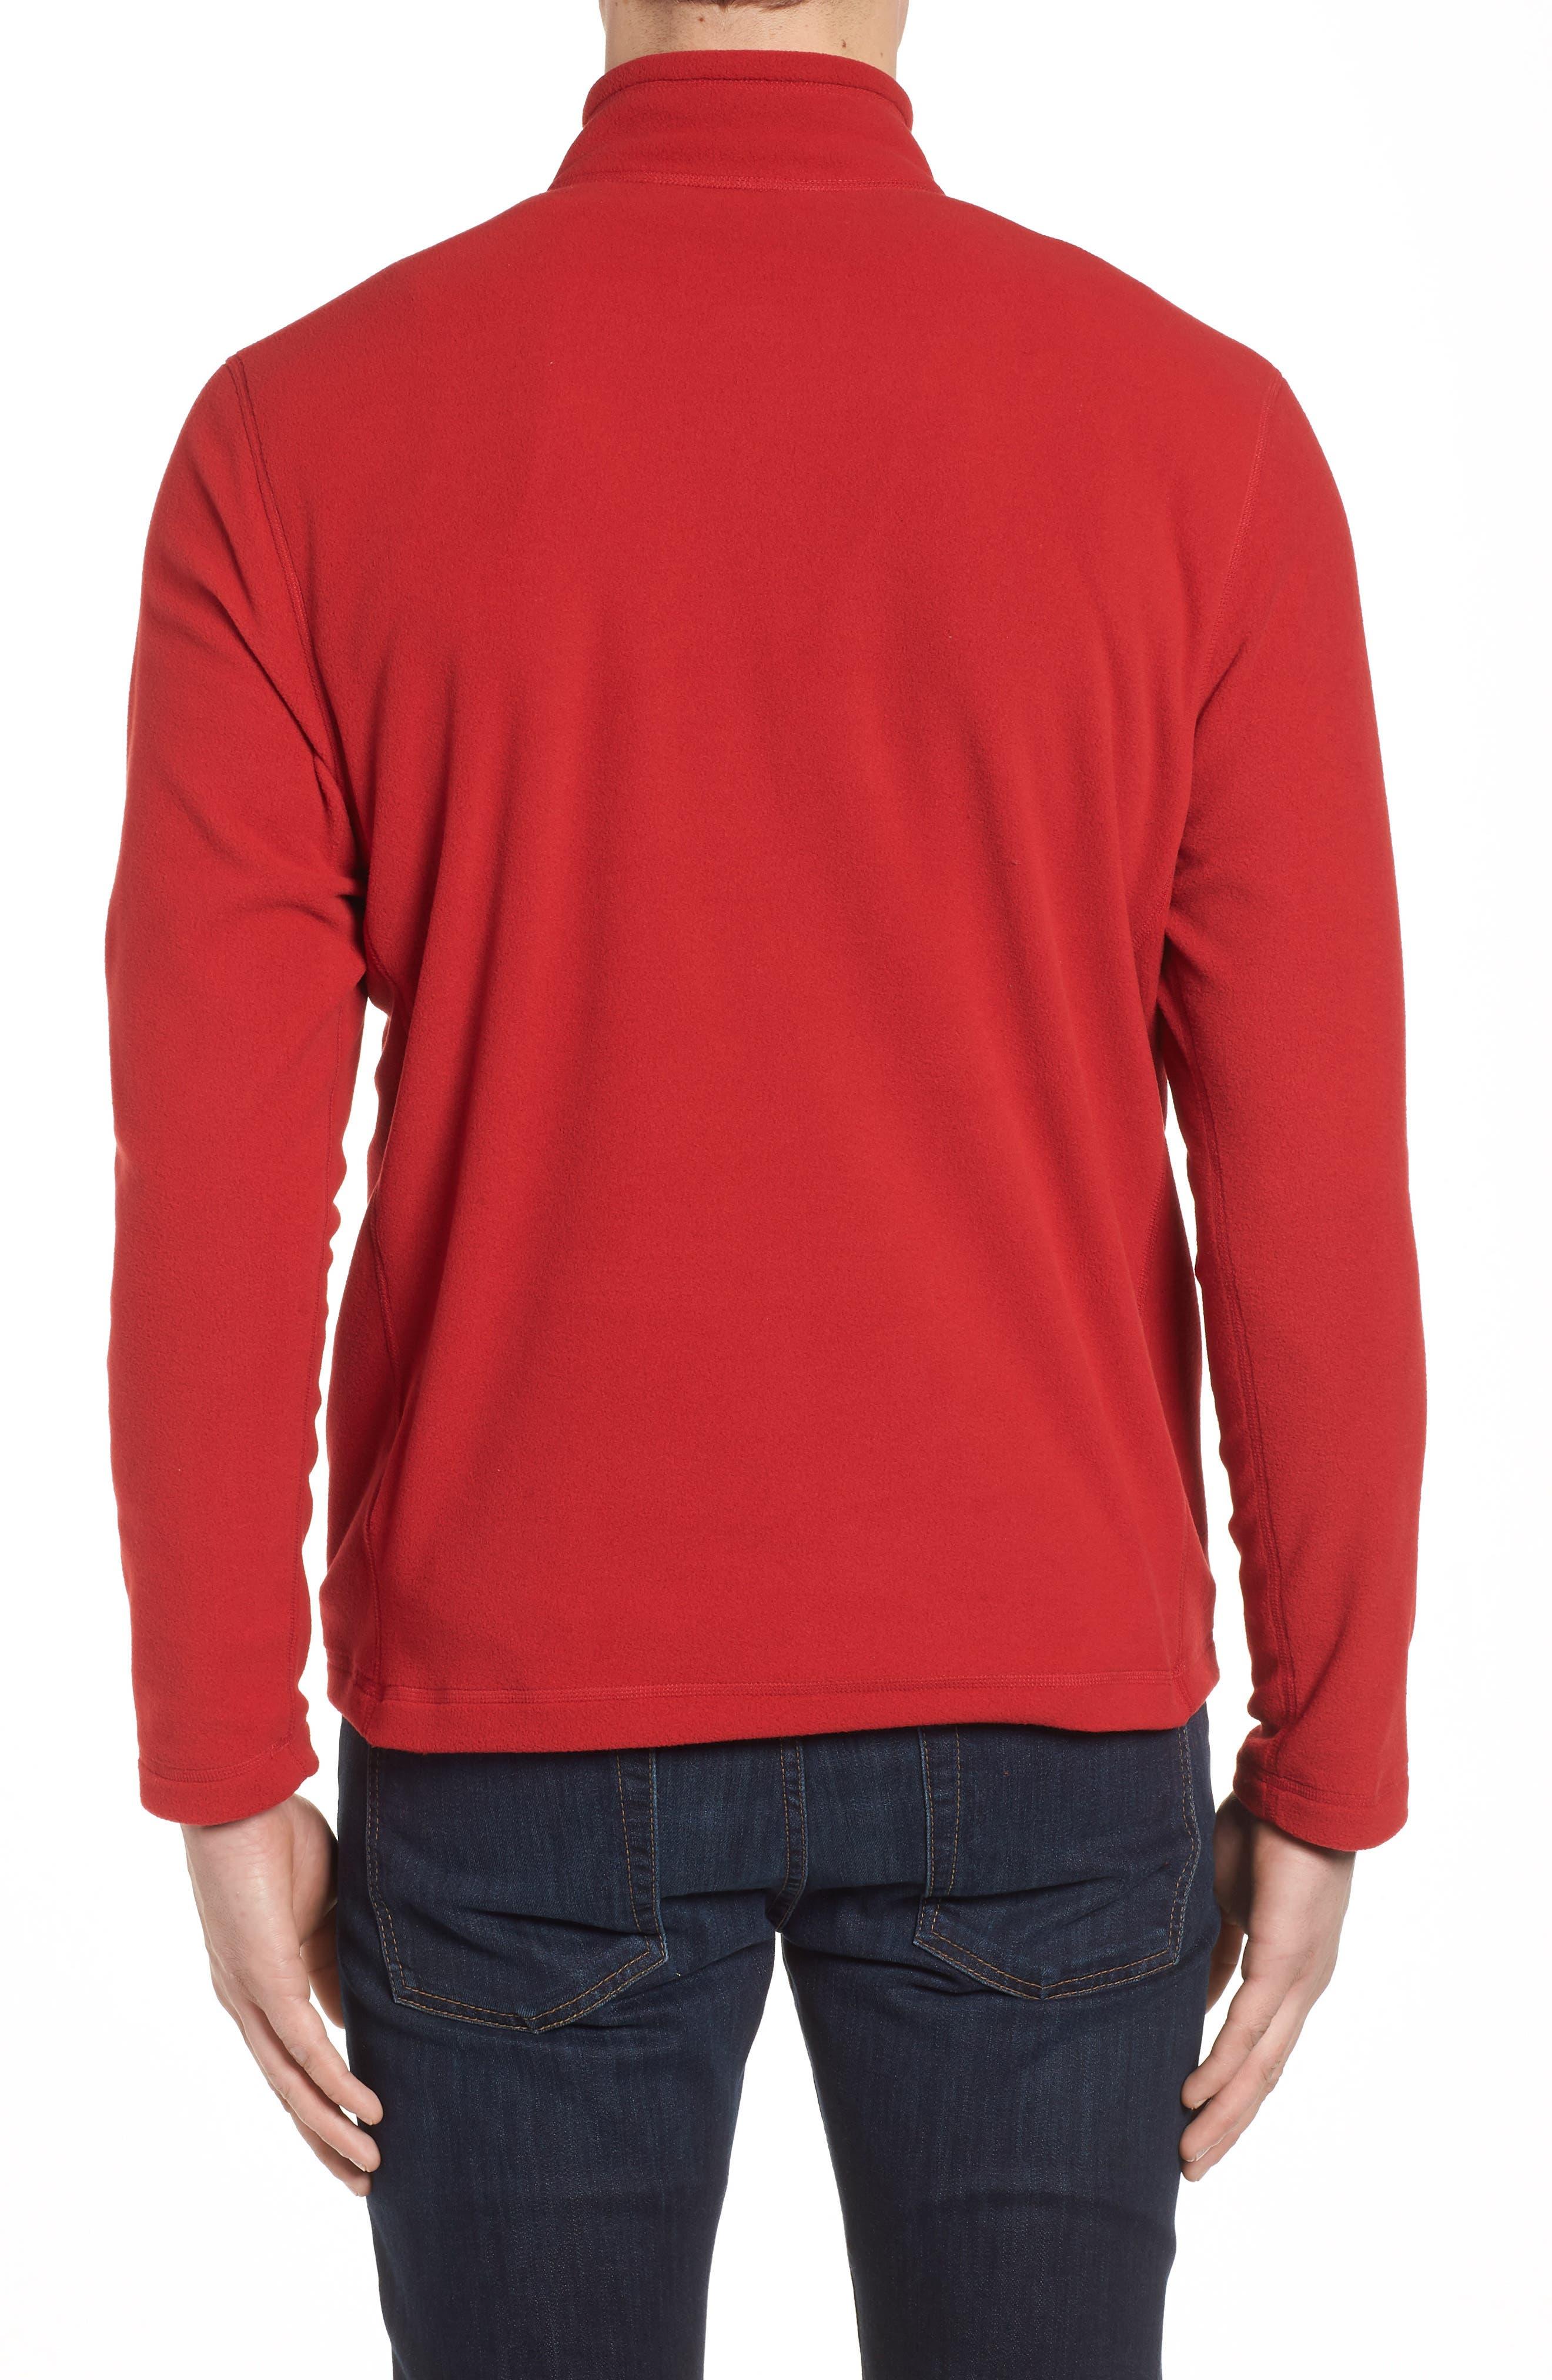 'TKA 100 Glacier' Quarter Zip Fleece Pullover,                             Alternate thumbnail 2, color,                             RAGE RED/ RAGE RED